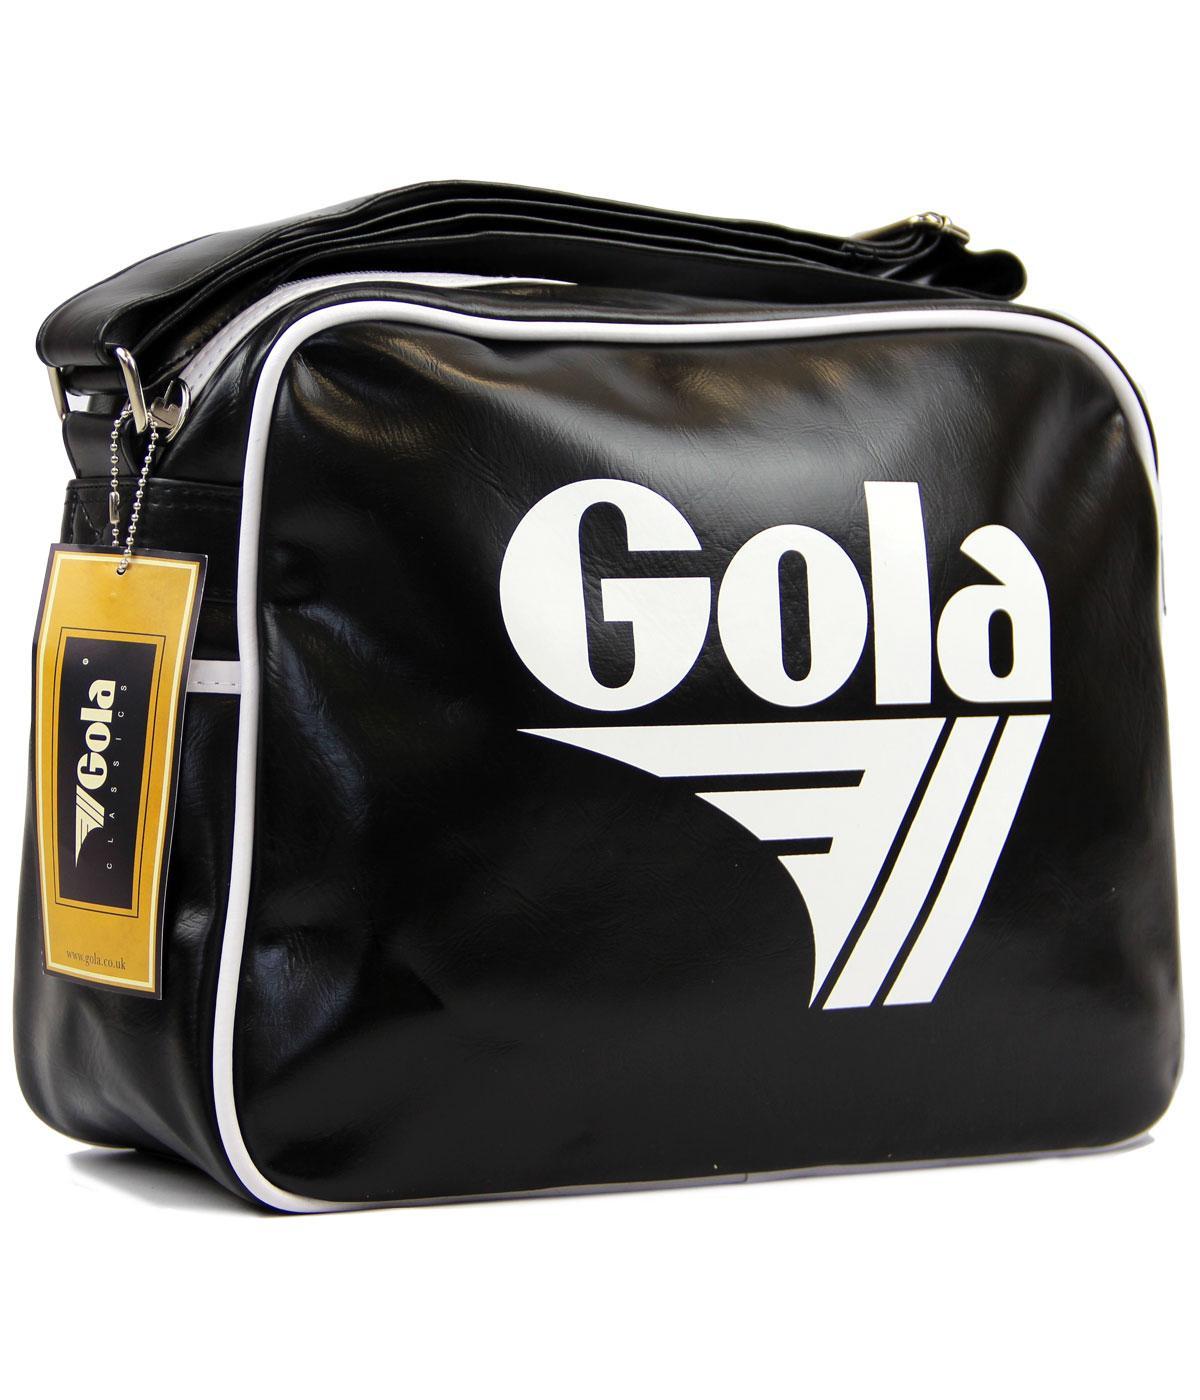 GOLA Redford Retro 70s Sports Shoulder Bag BLK/WHT